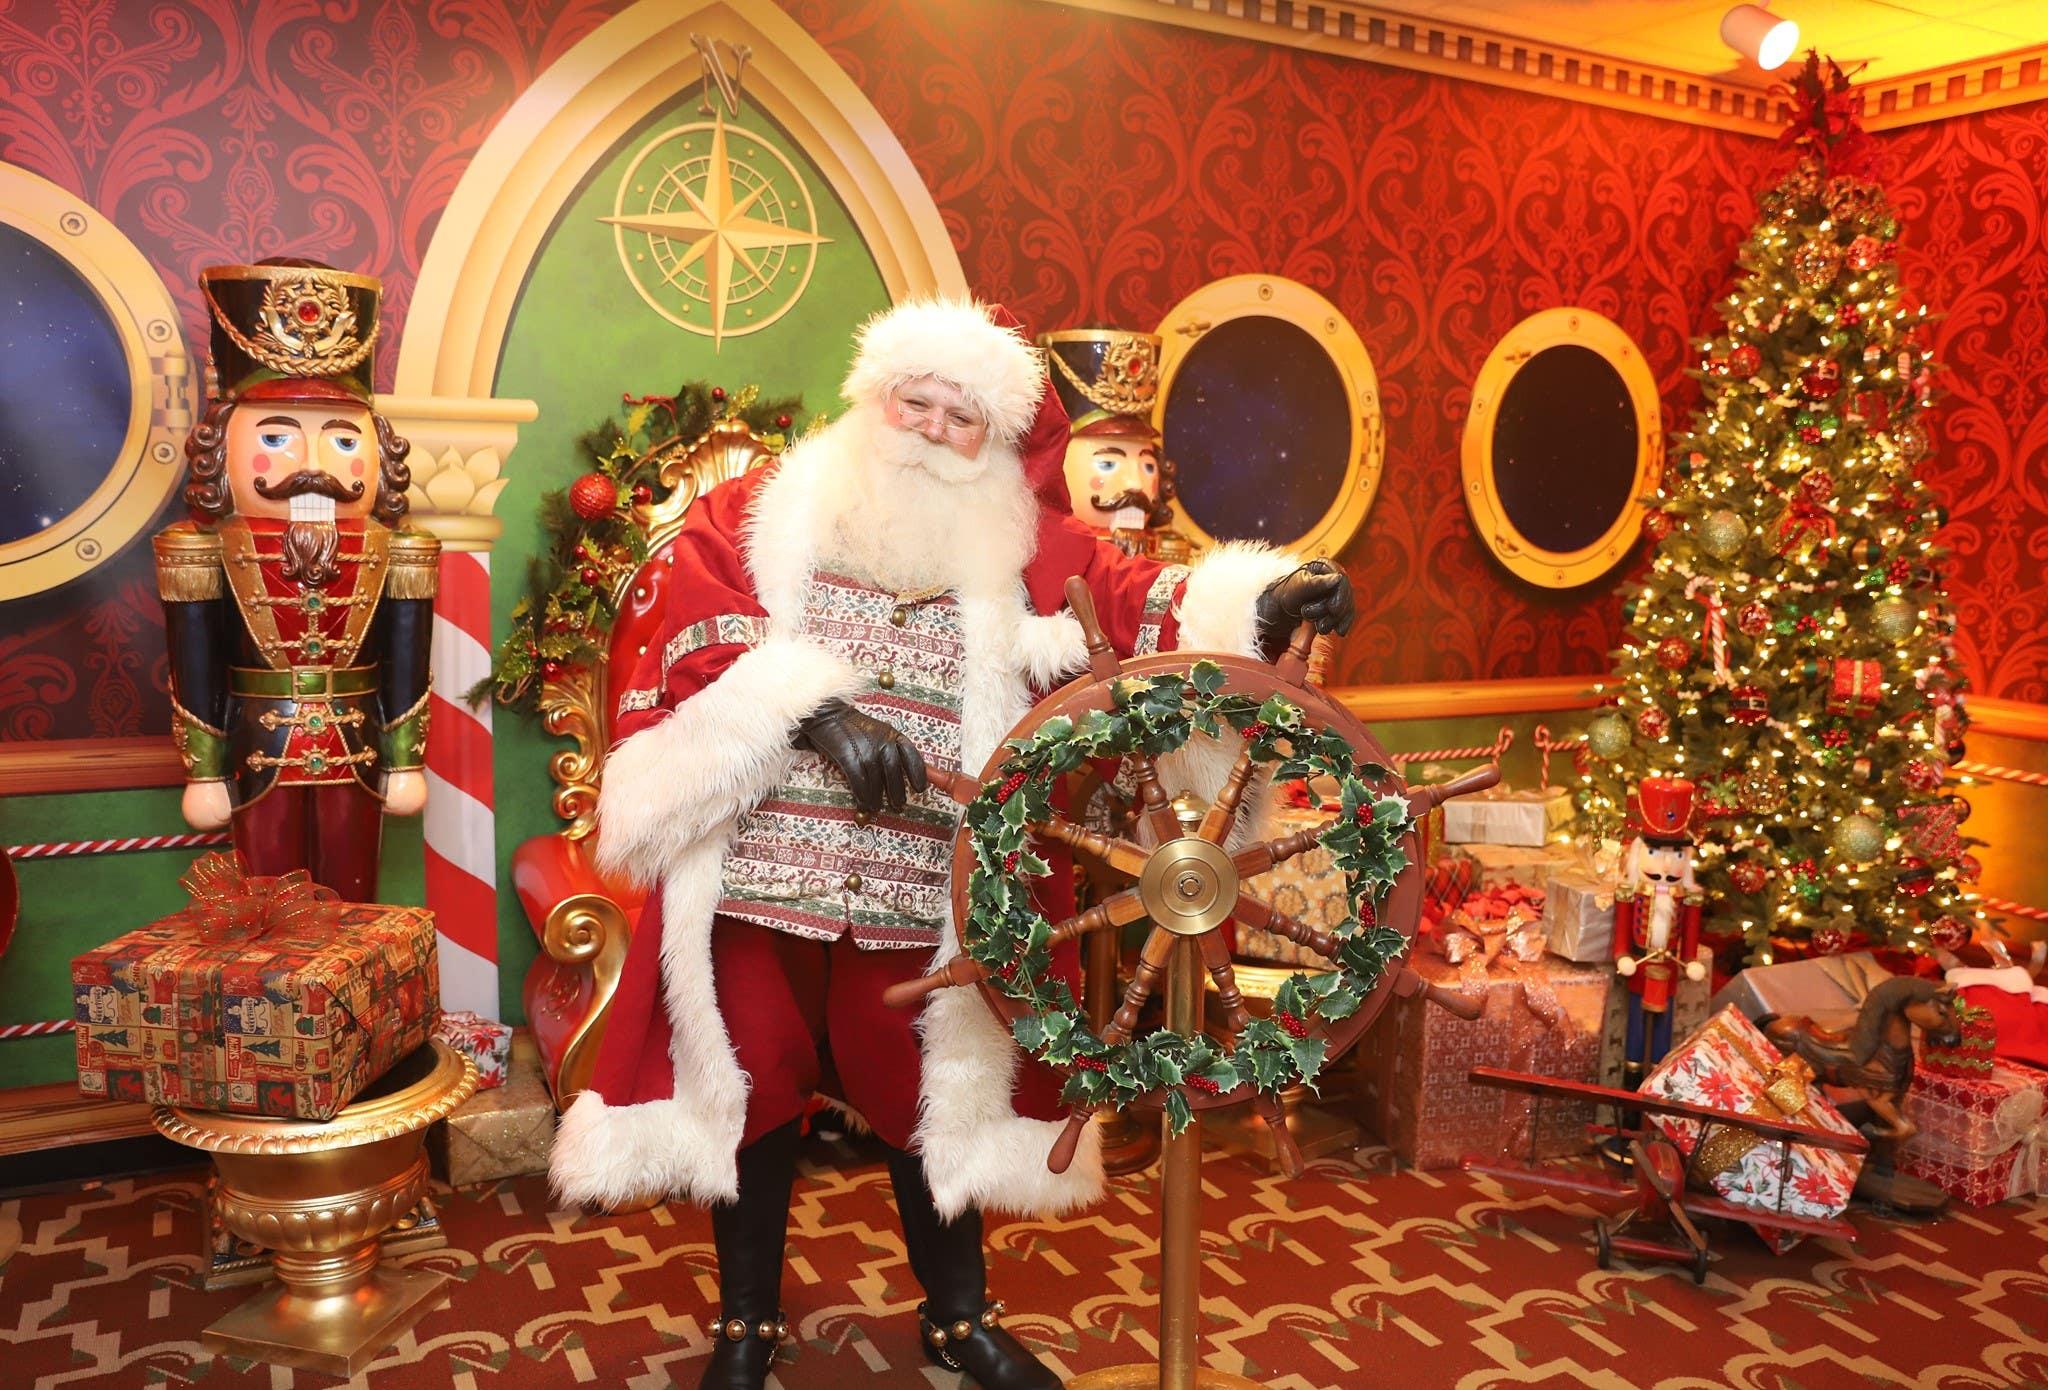 Santa Claus in the Captain's Quartersat Queen Mary Christmas